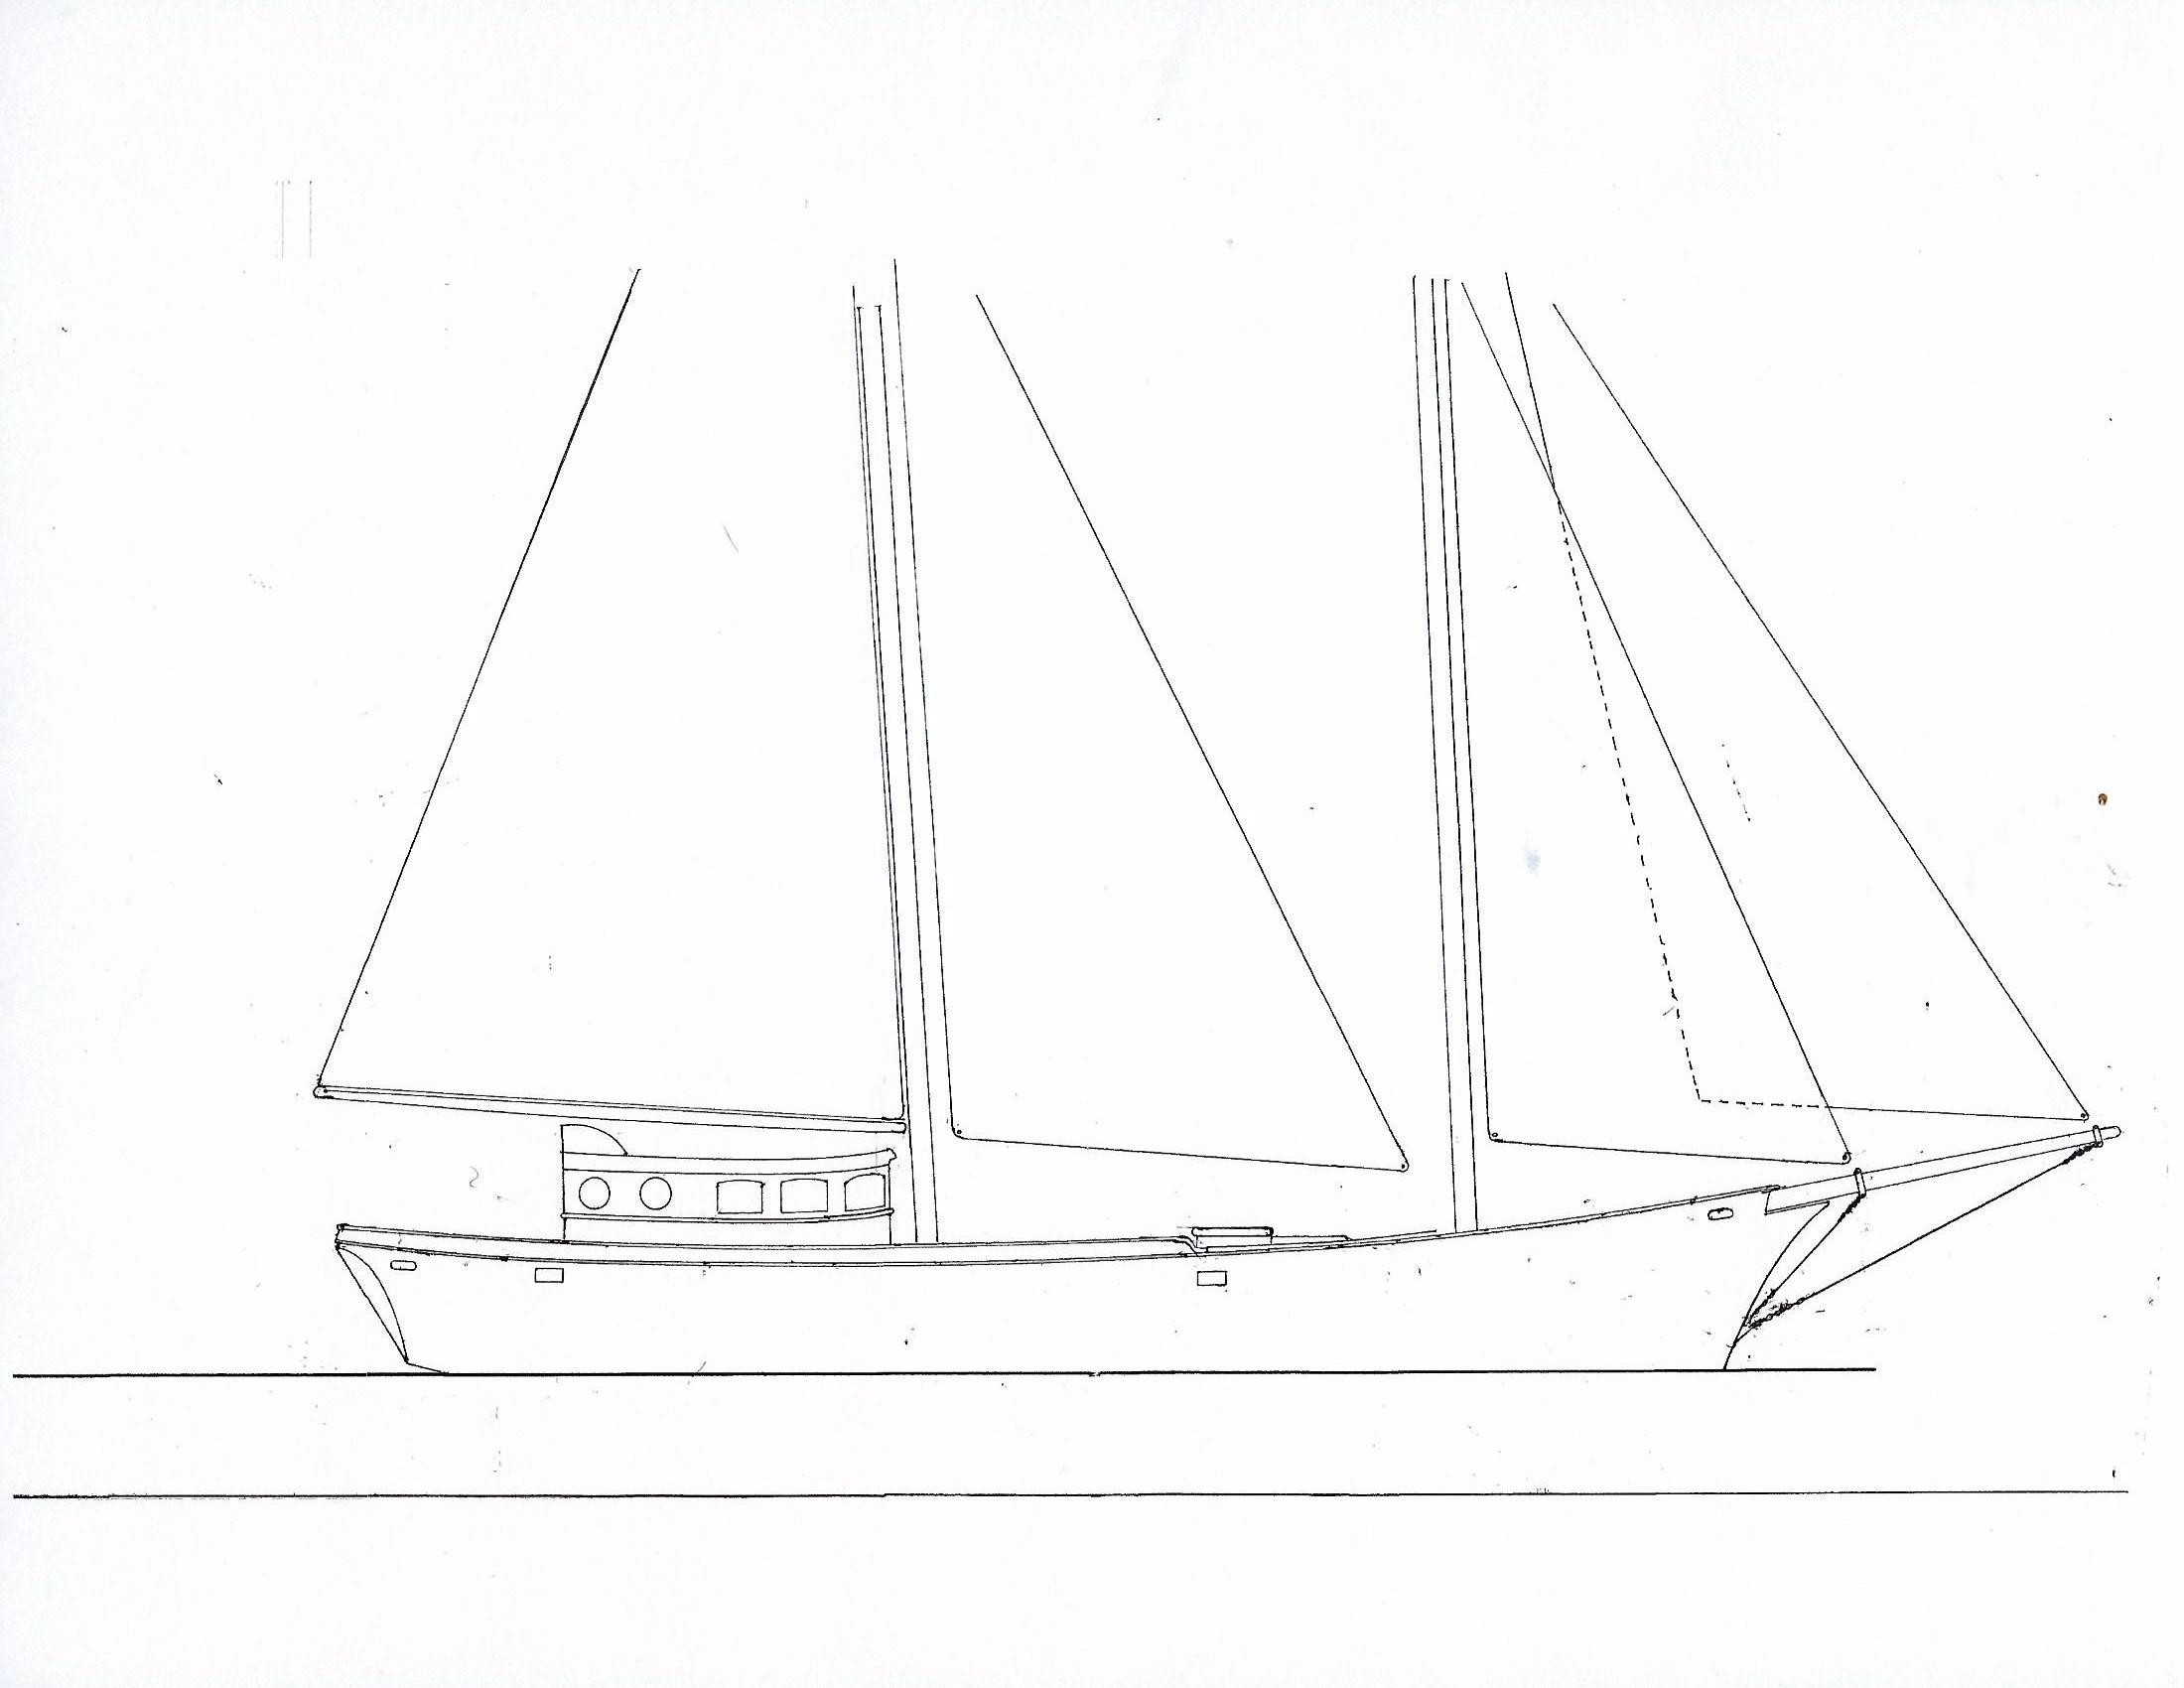 Schooner Staysail